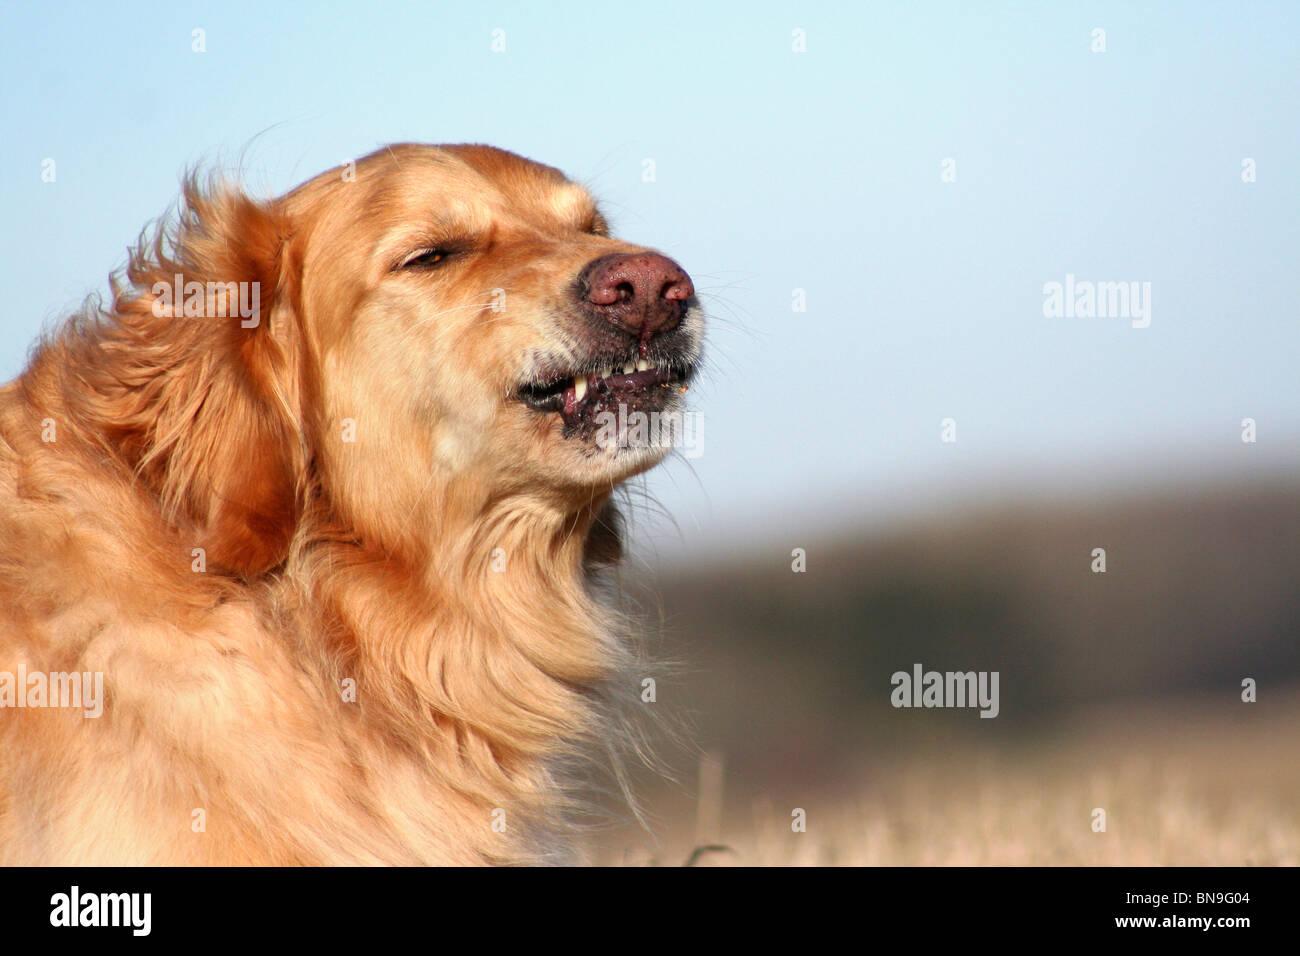 Golden Retriever Portrait - Stock Image